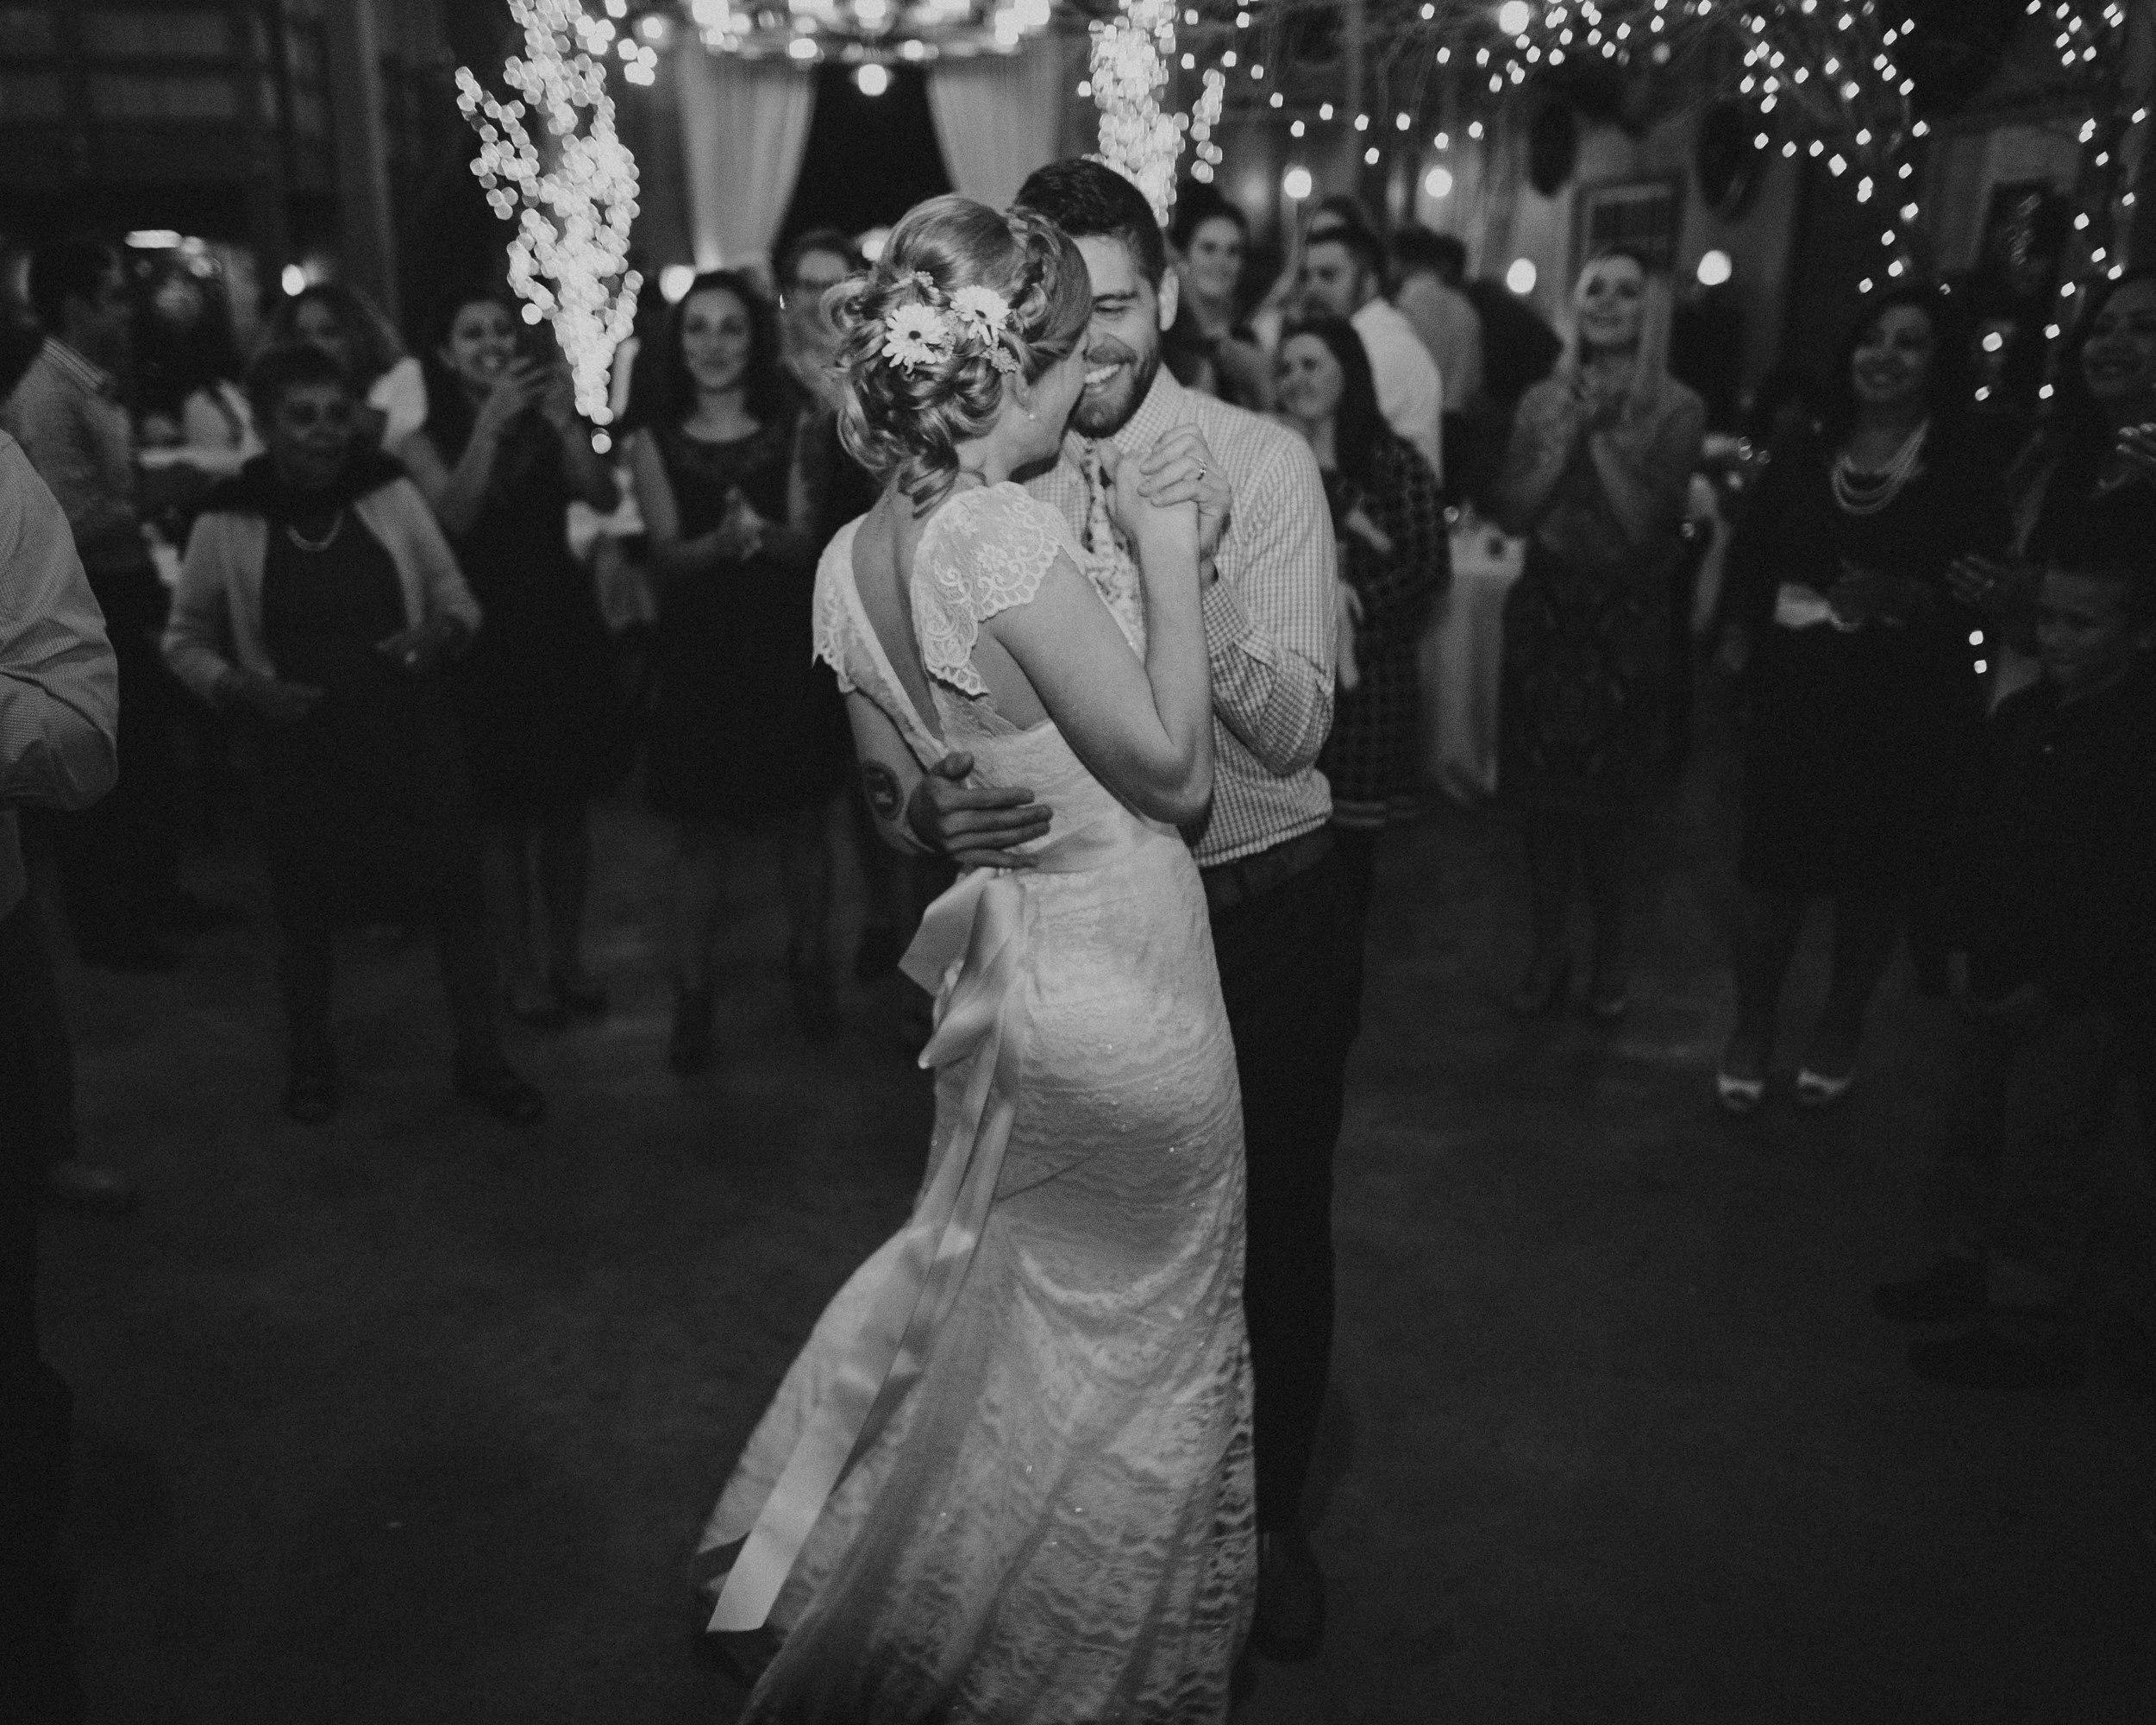 Salt-Lake-City-Utah-Wedding-Photographer-57.jpg